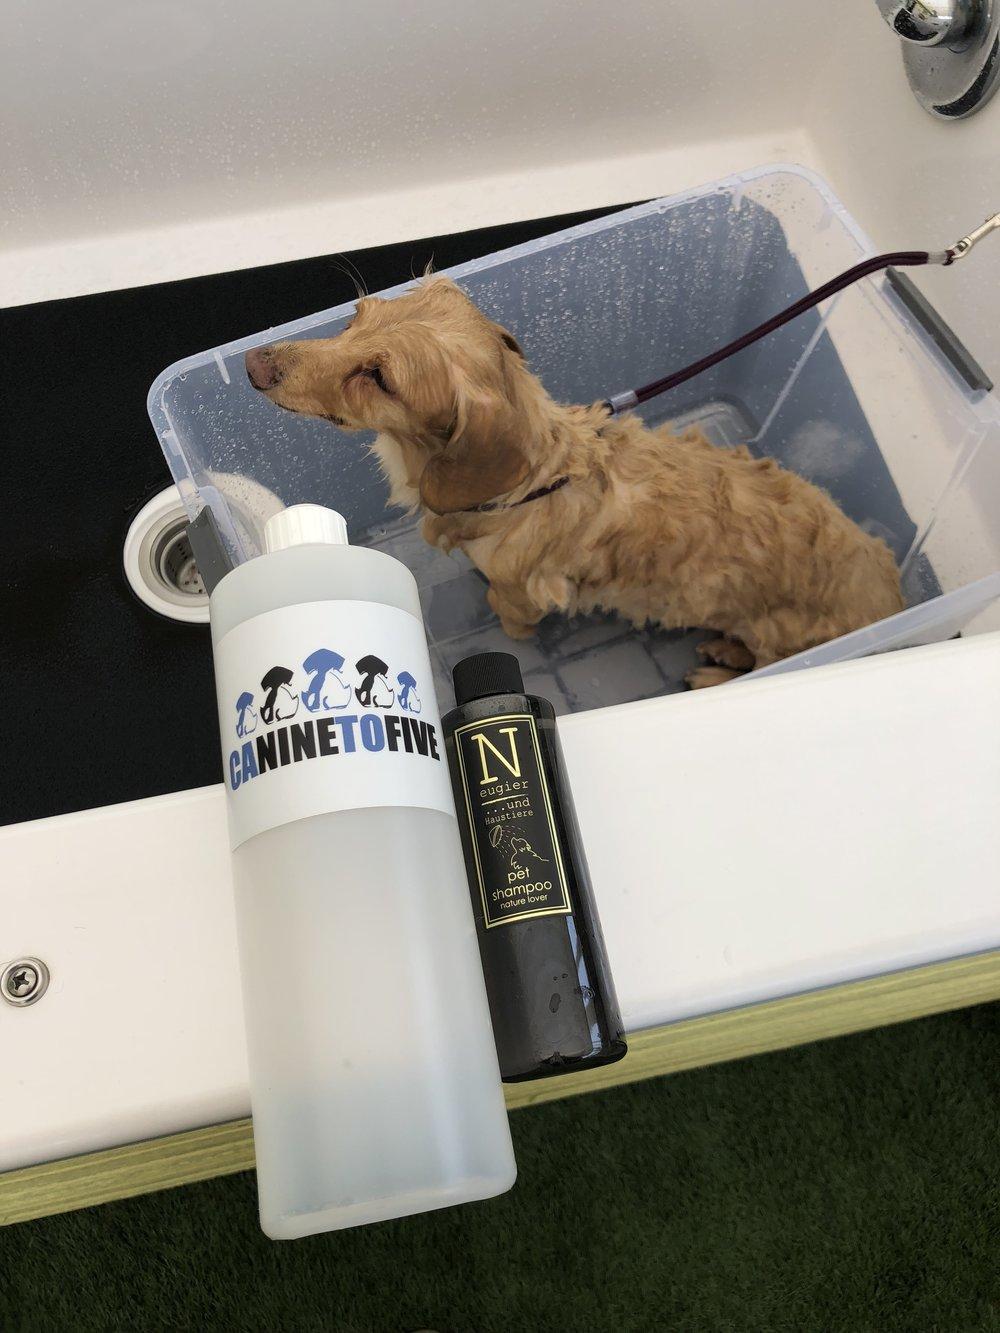 Making shampoo